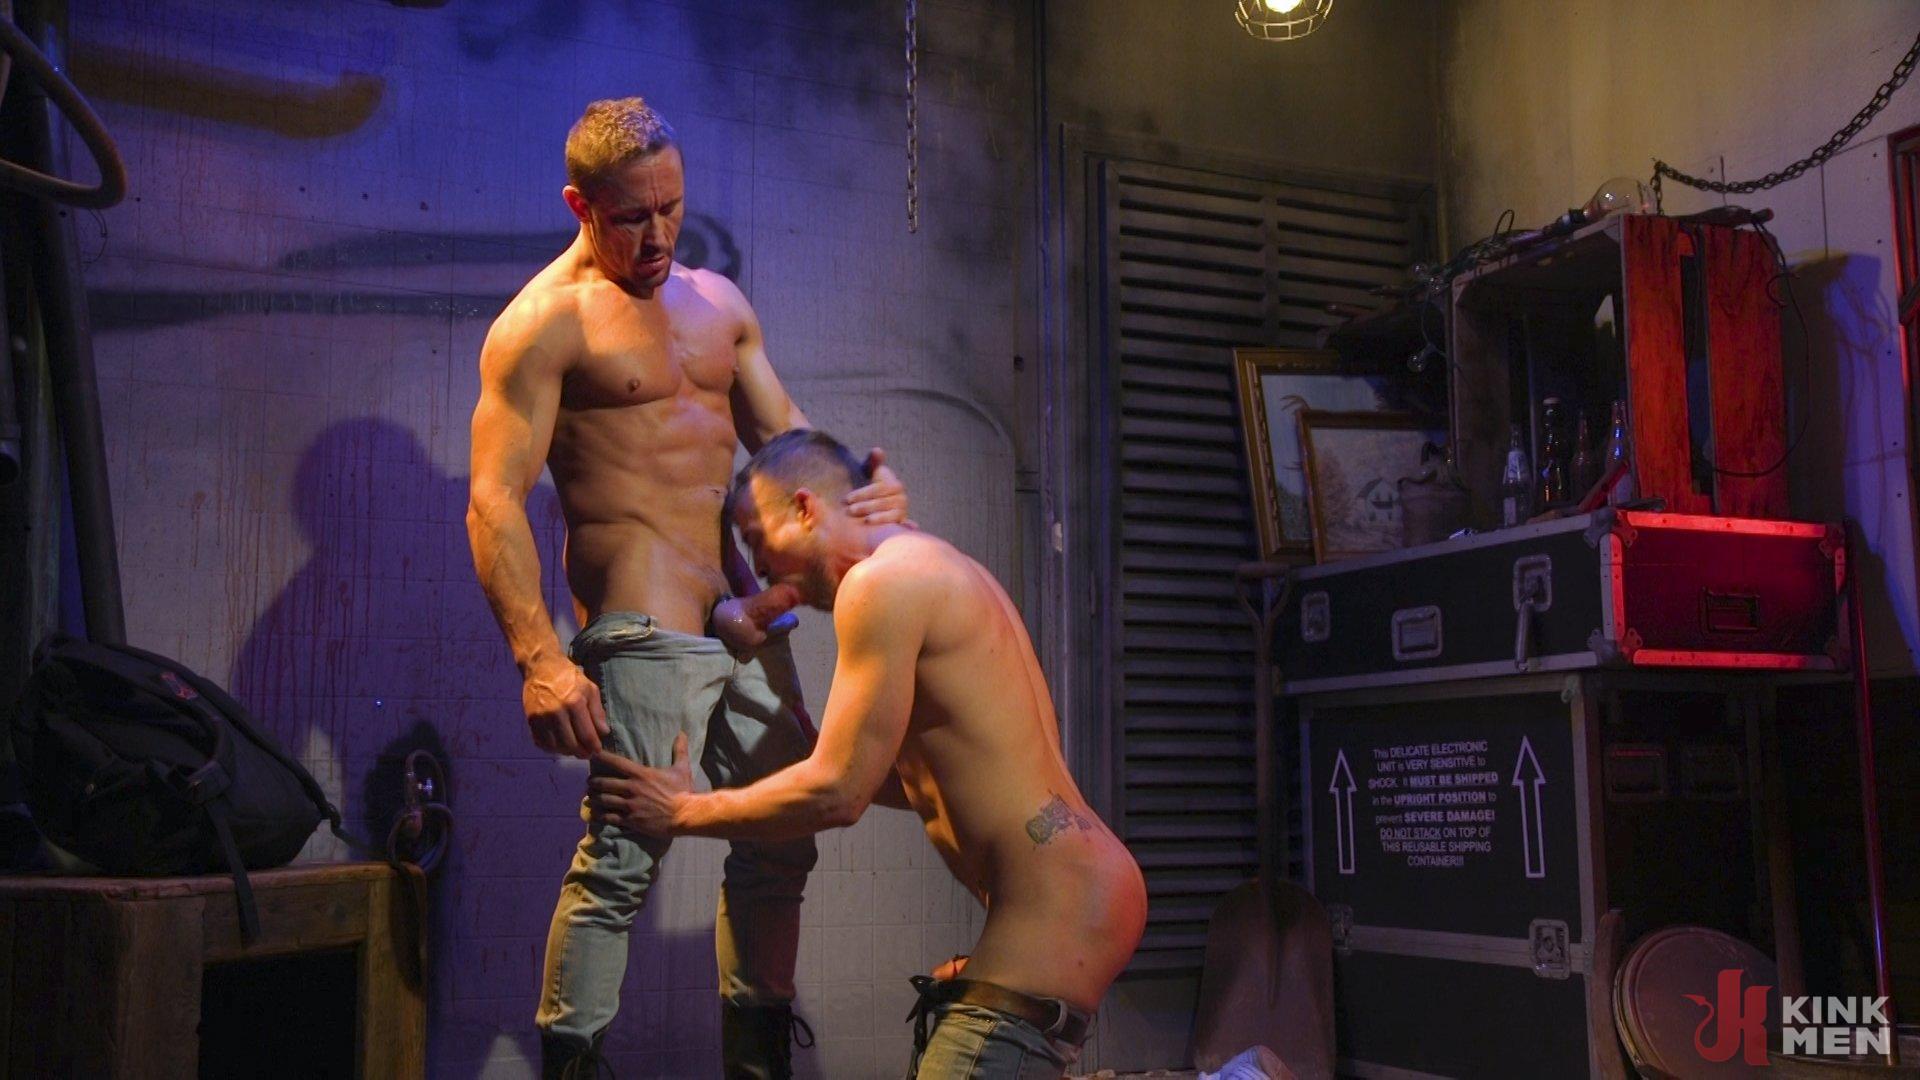 Photo number 9 from Street Meat: Back Alley Bondage shot for Bound Gods on Kink.com. Featuring Jay Austin  and Myles Landon in hardcore BDSM & Fetish porn.